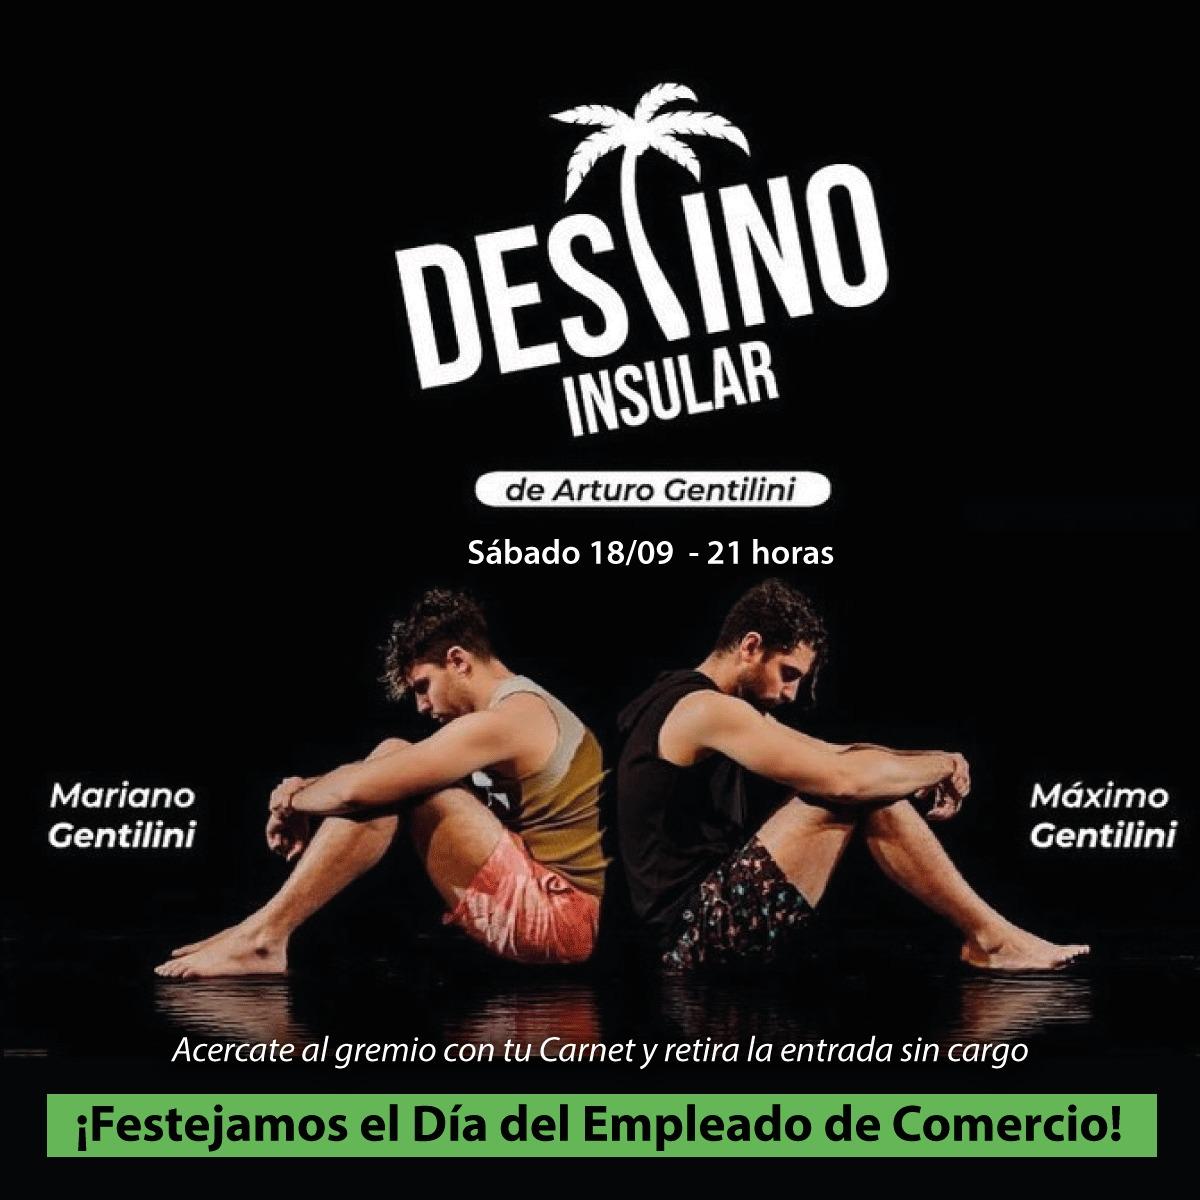 Destino Insular